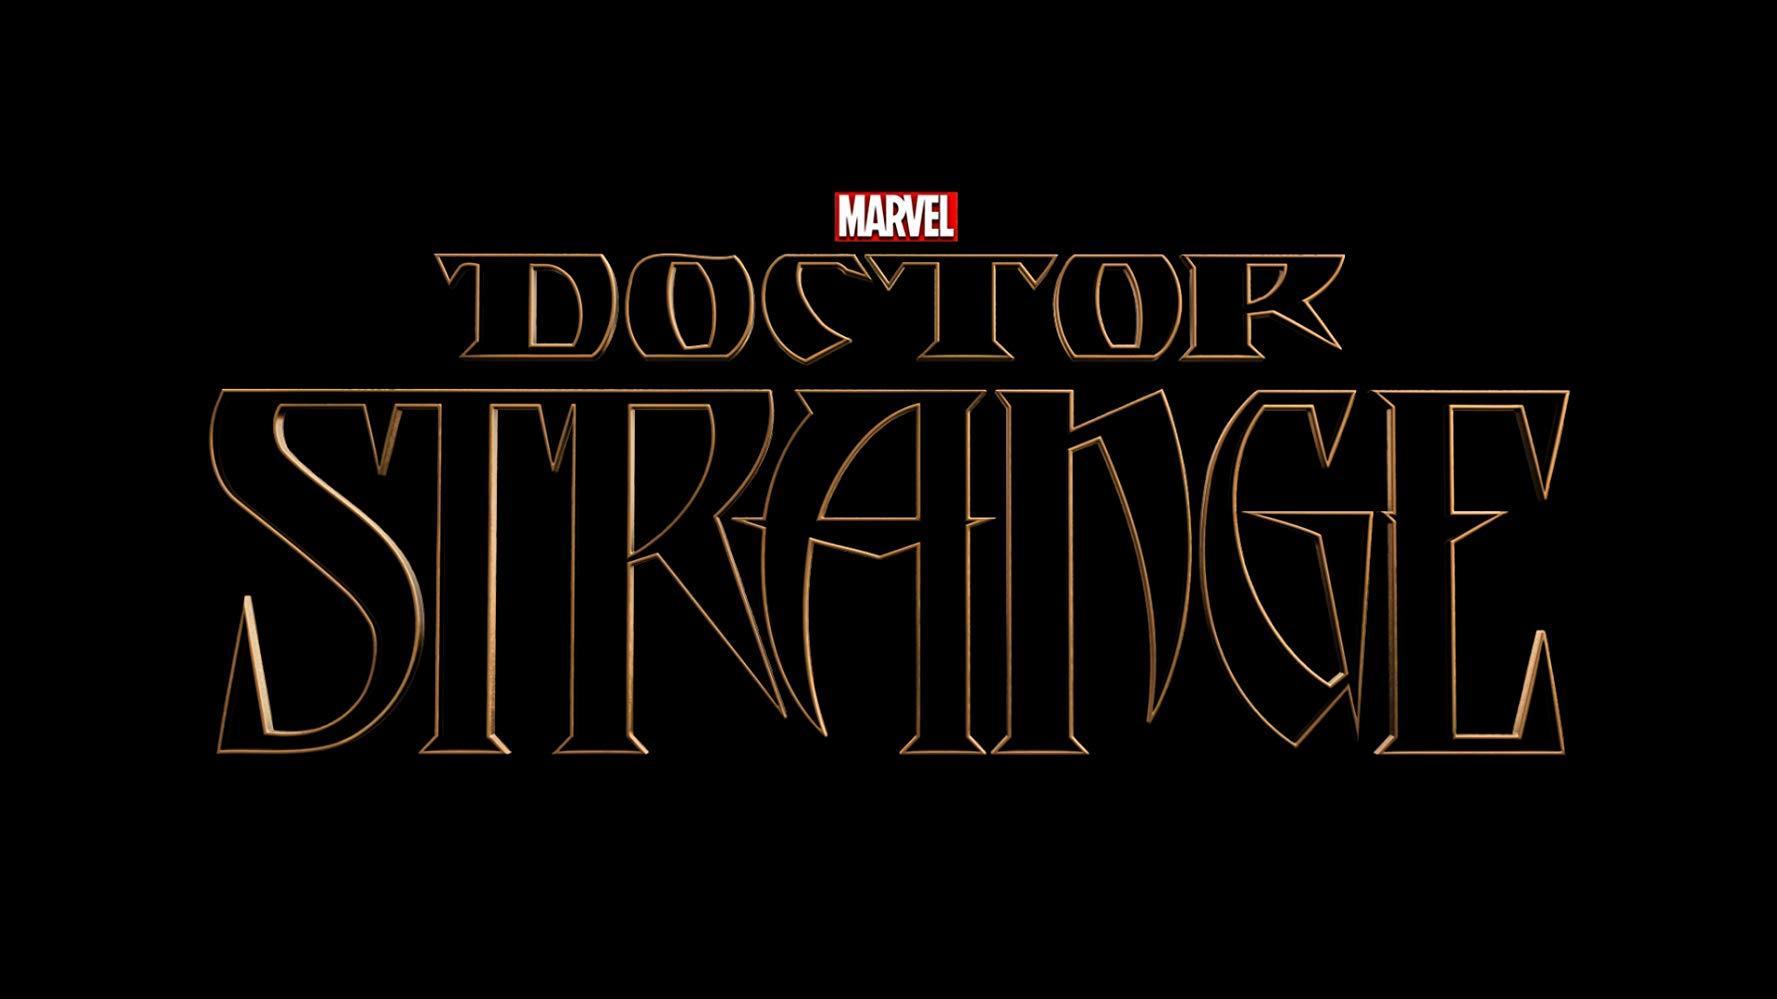 فيلم Doctor Strange 2016 مترجم